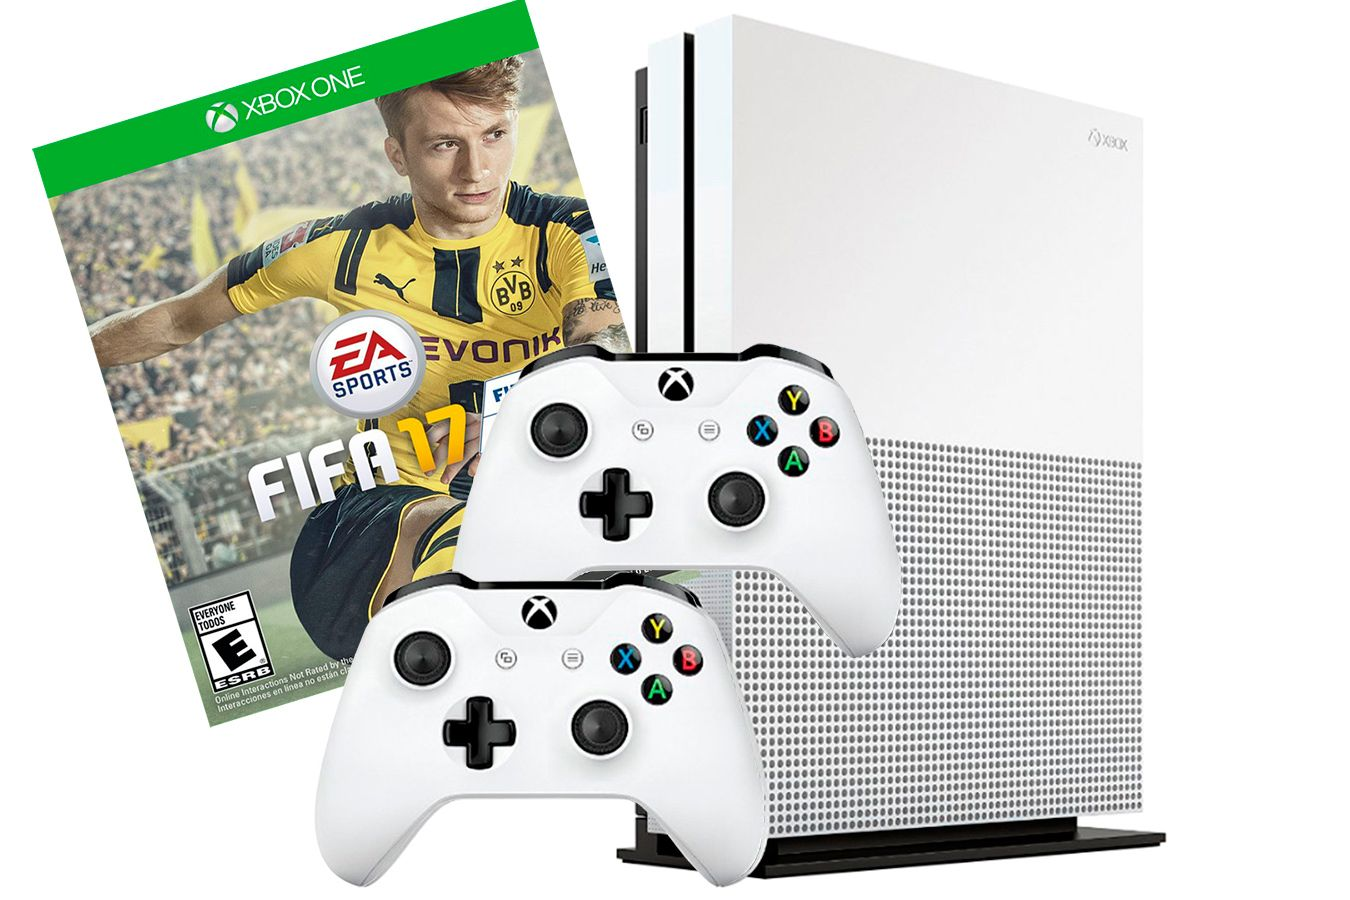 Xbox One S 500Gb 2 джойстика, FIFA 17 и игровая приставка  [SXO5F2]